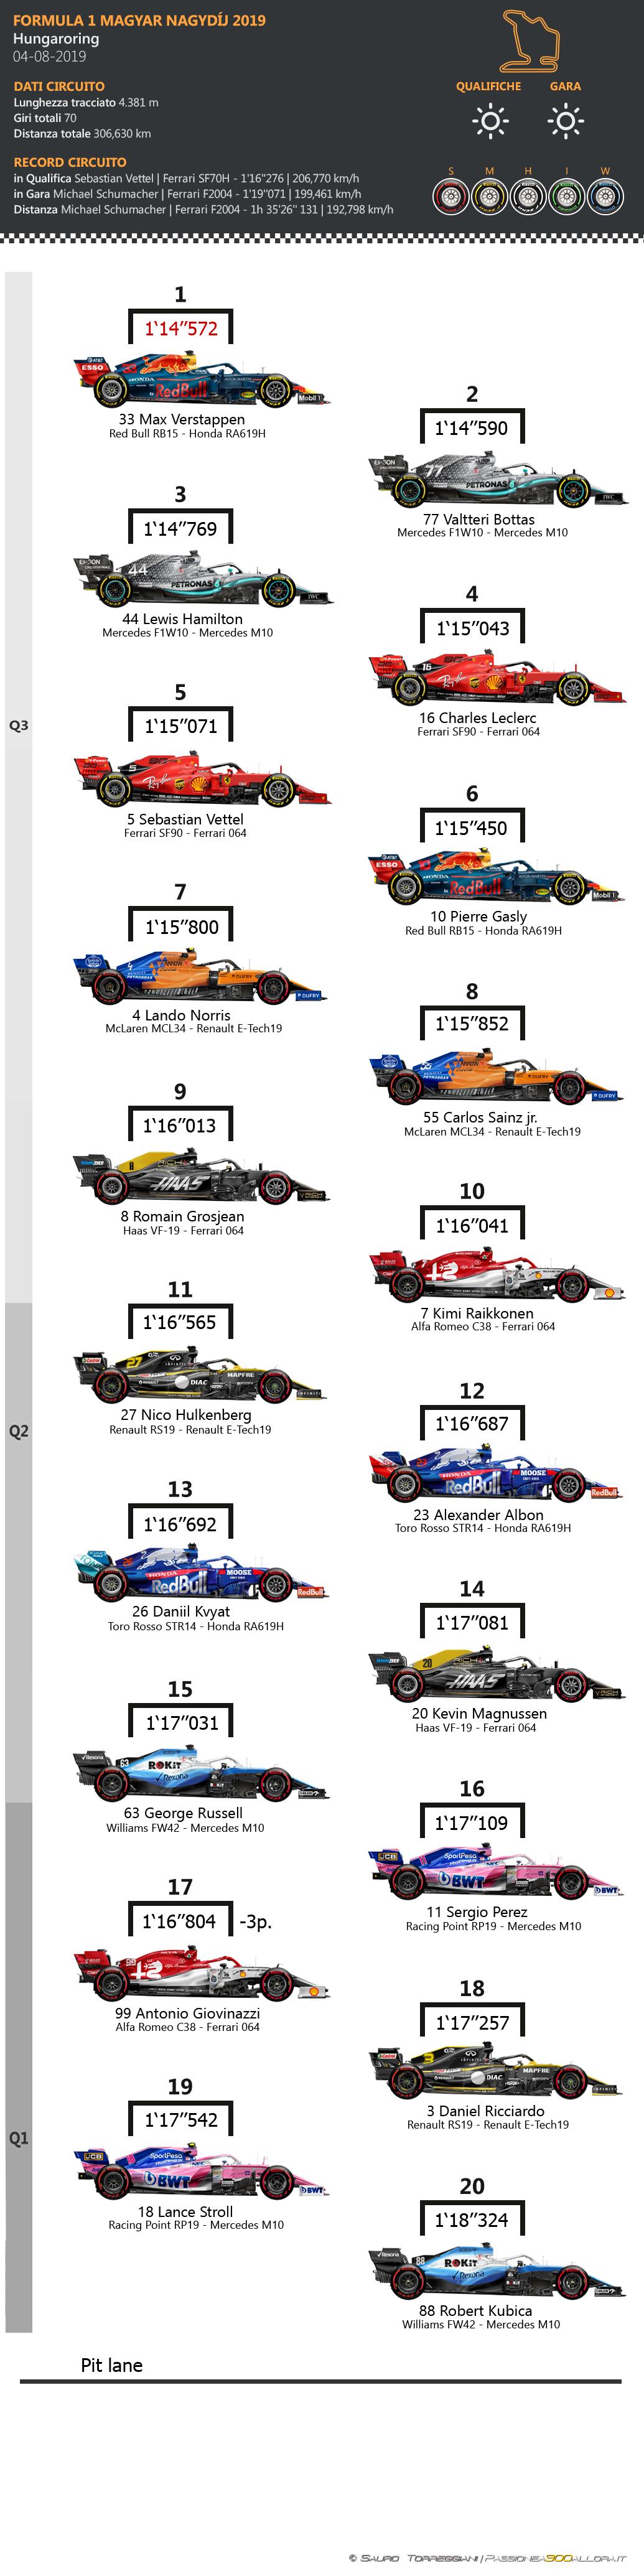 F1 | GP d'Ungheria 2019: griglia di partenza, penalità e set a disposizione 1